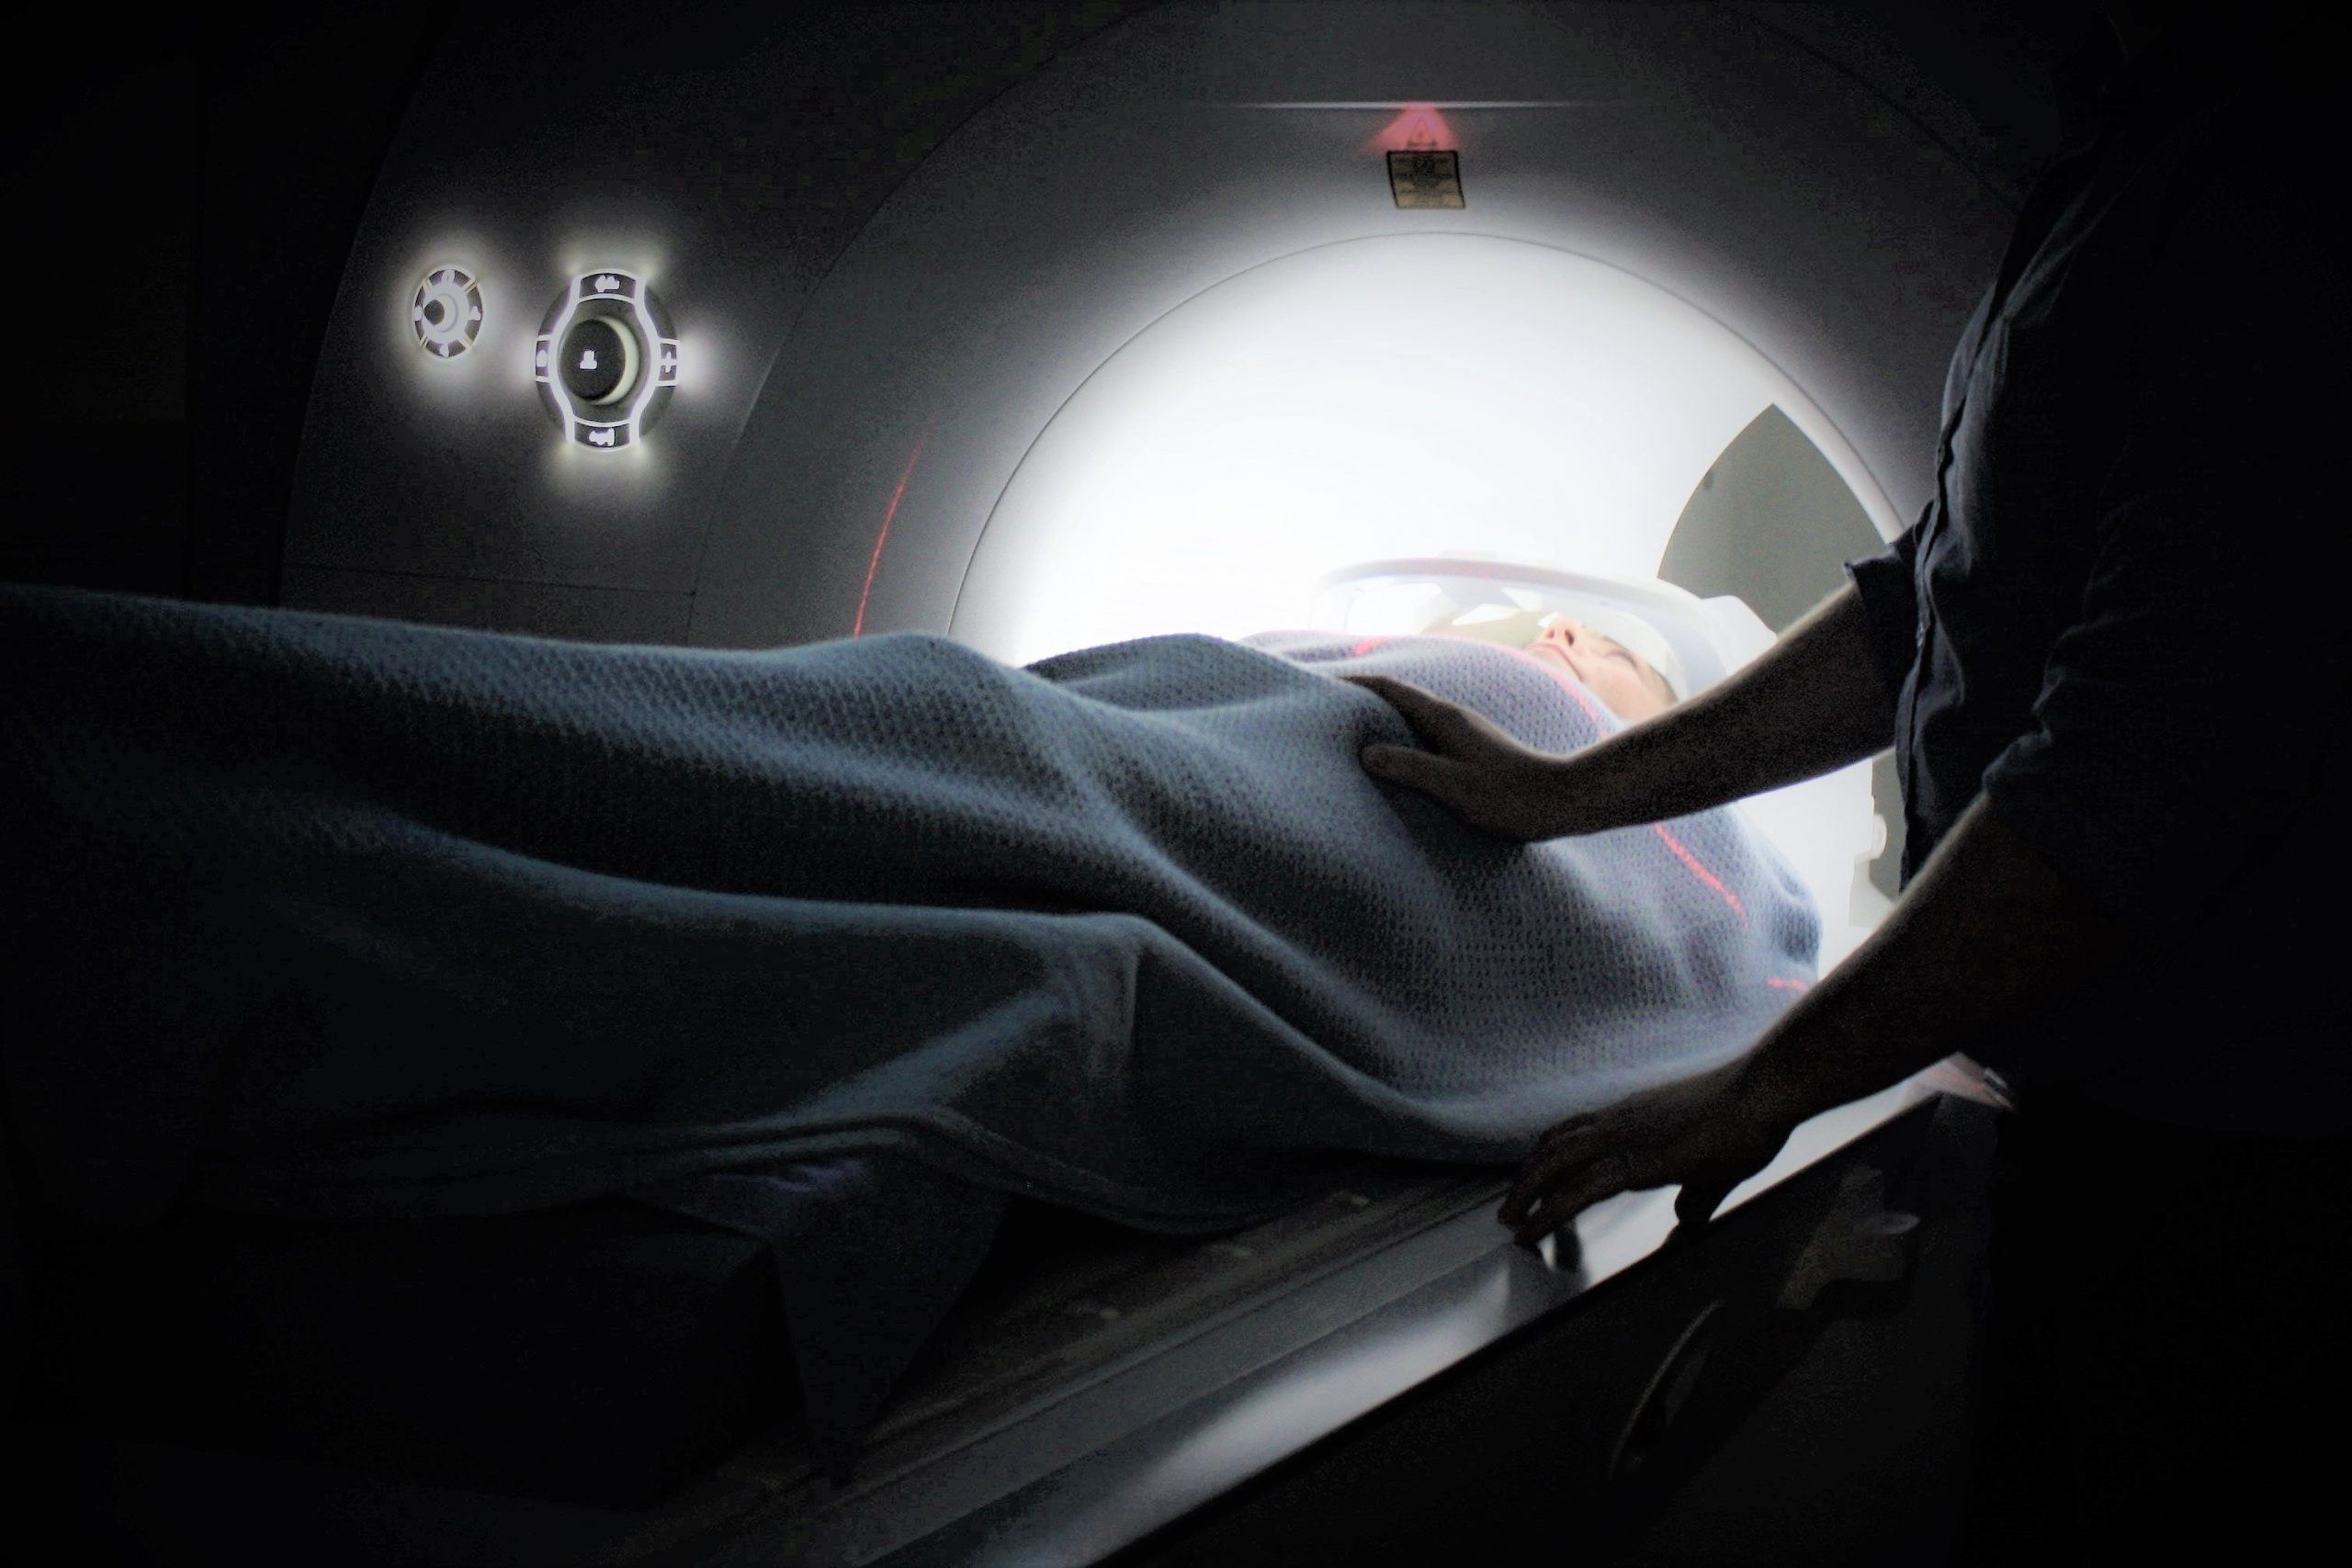 radiologo - rosario marangio - santabarbara hospital gela